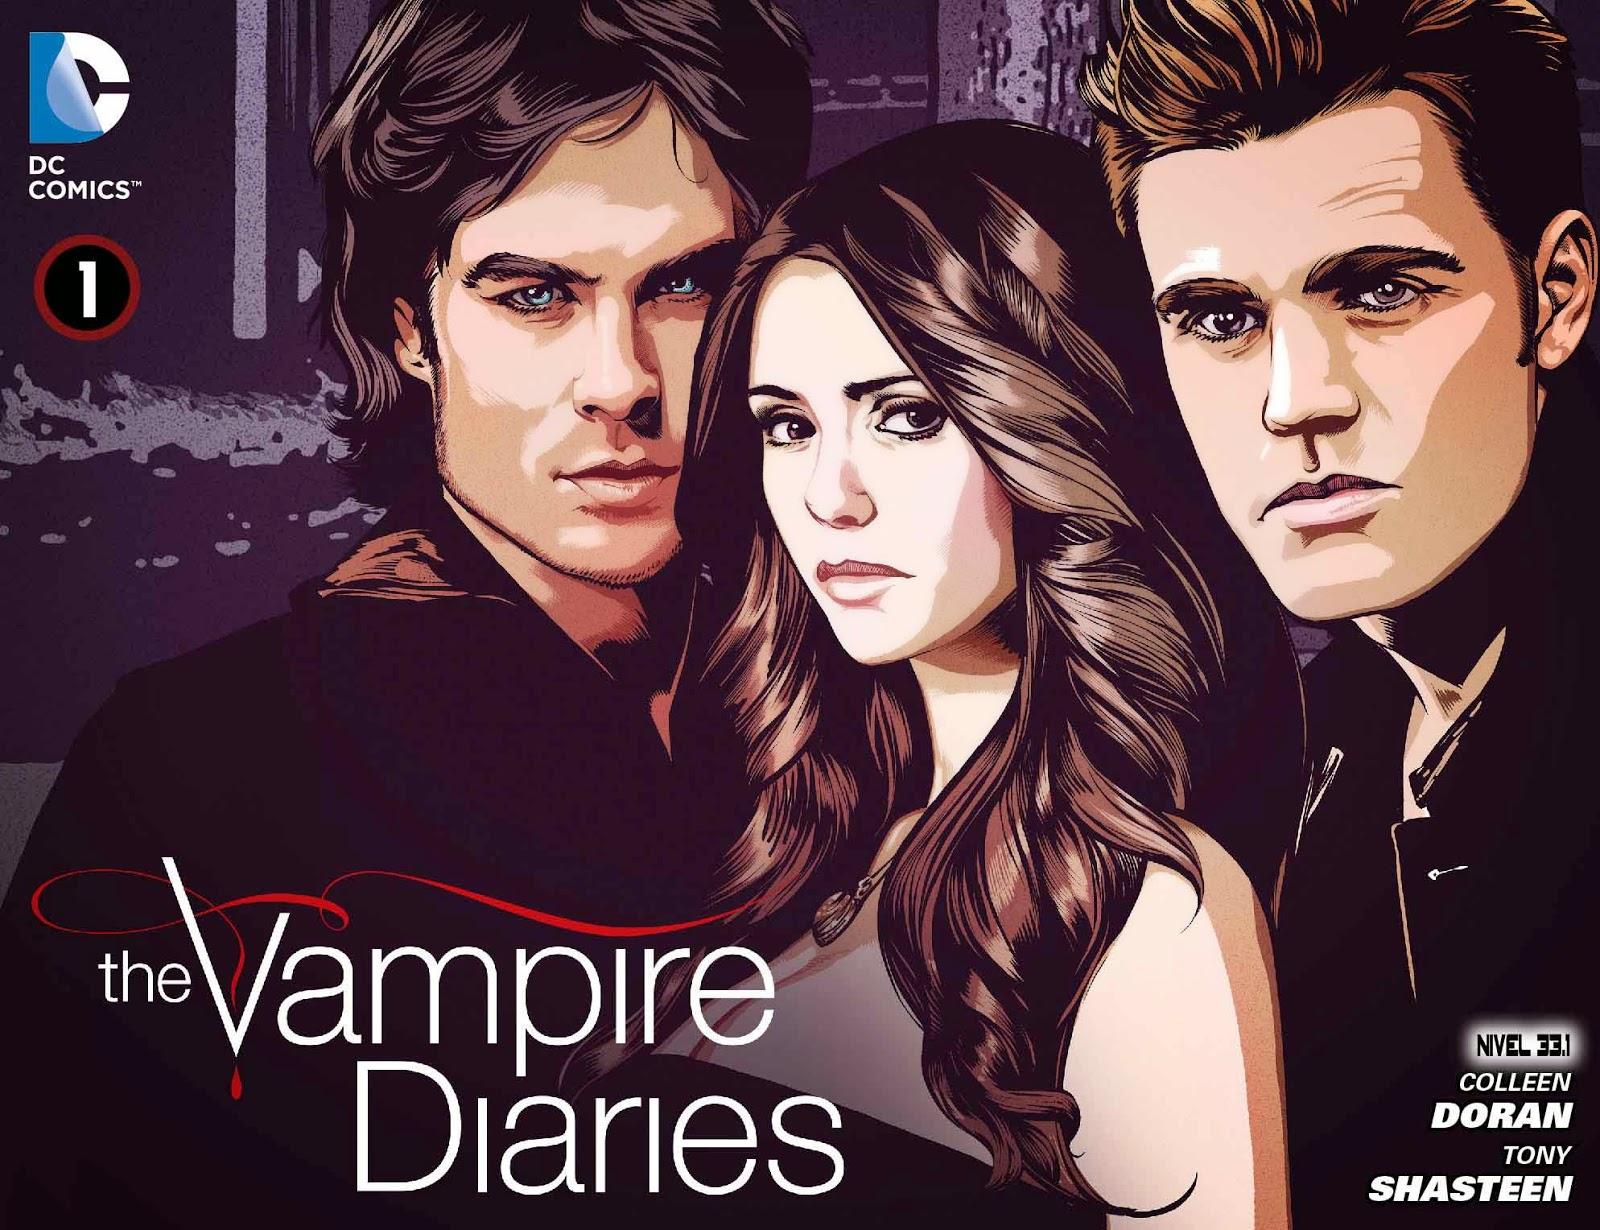 http://www.mediafire.com/download/c6cv5nmgmpv0ila/Vampires+1.cbr